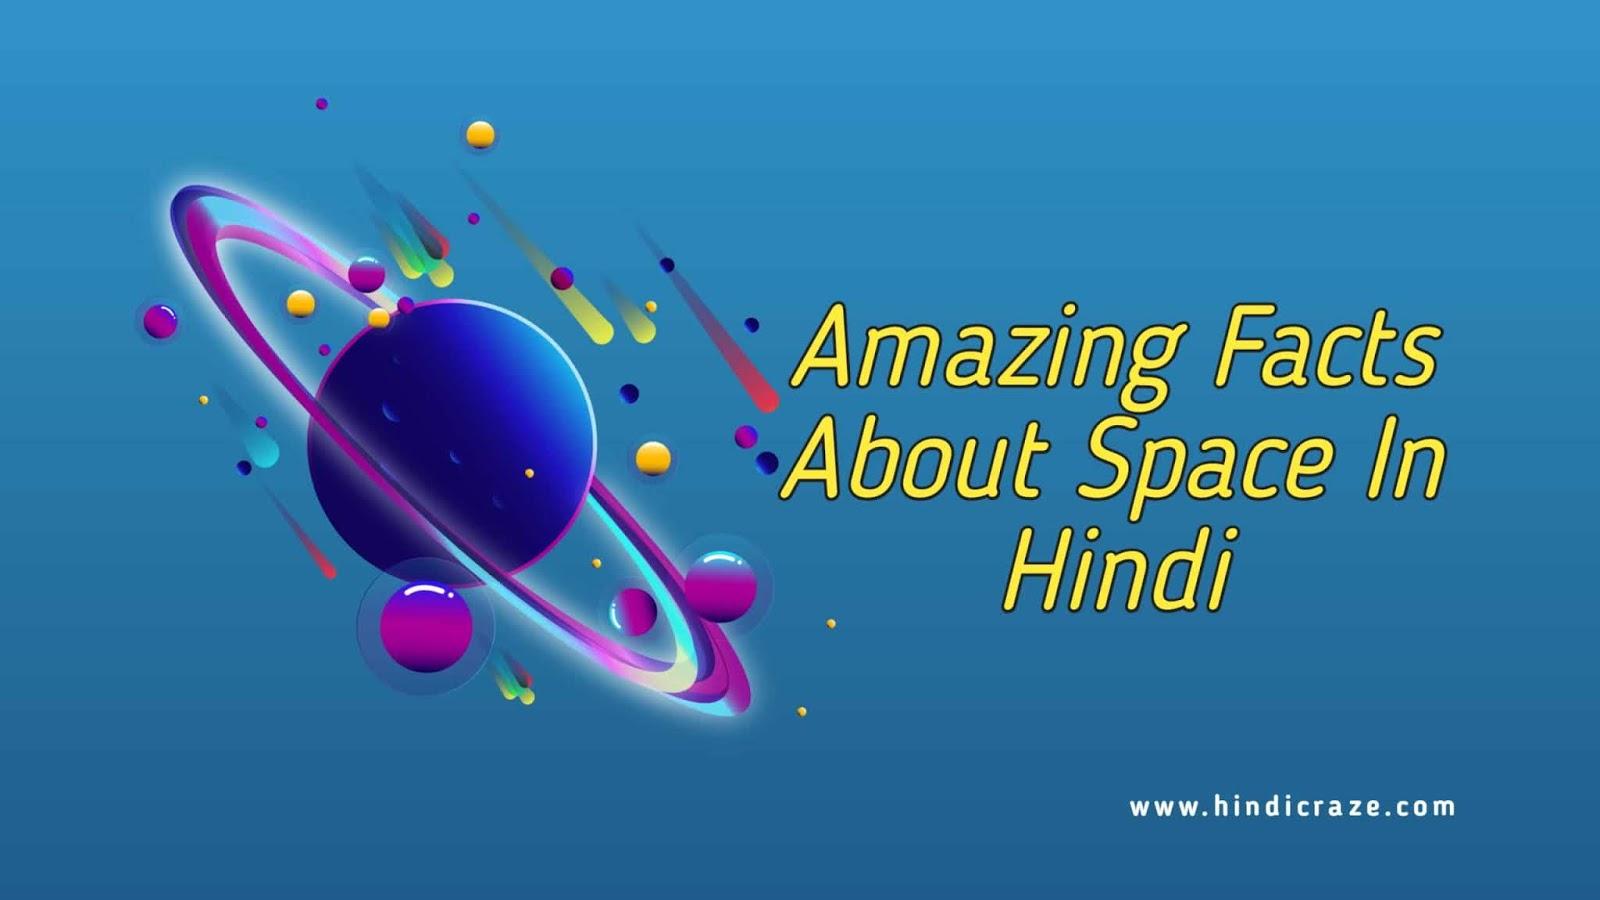 Amazing Facts- space - रोचक तथ्य हिंदी में